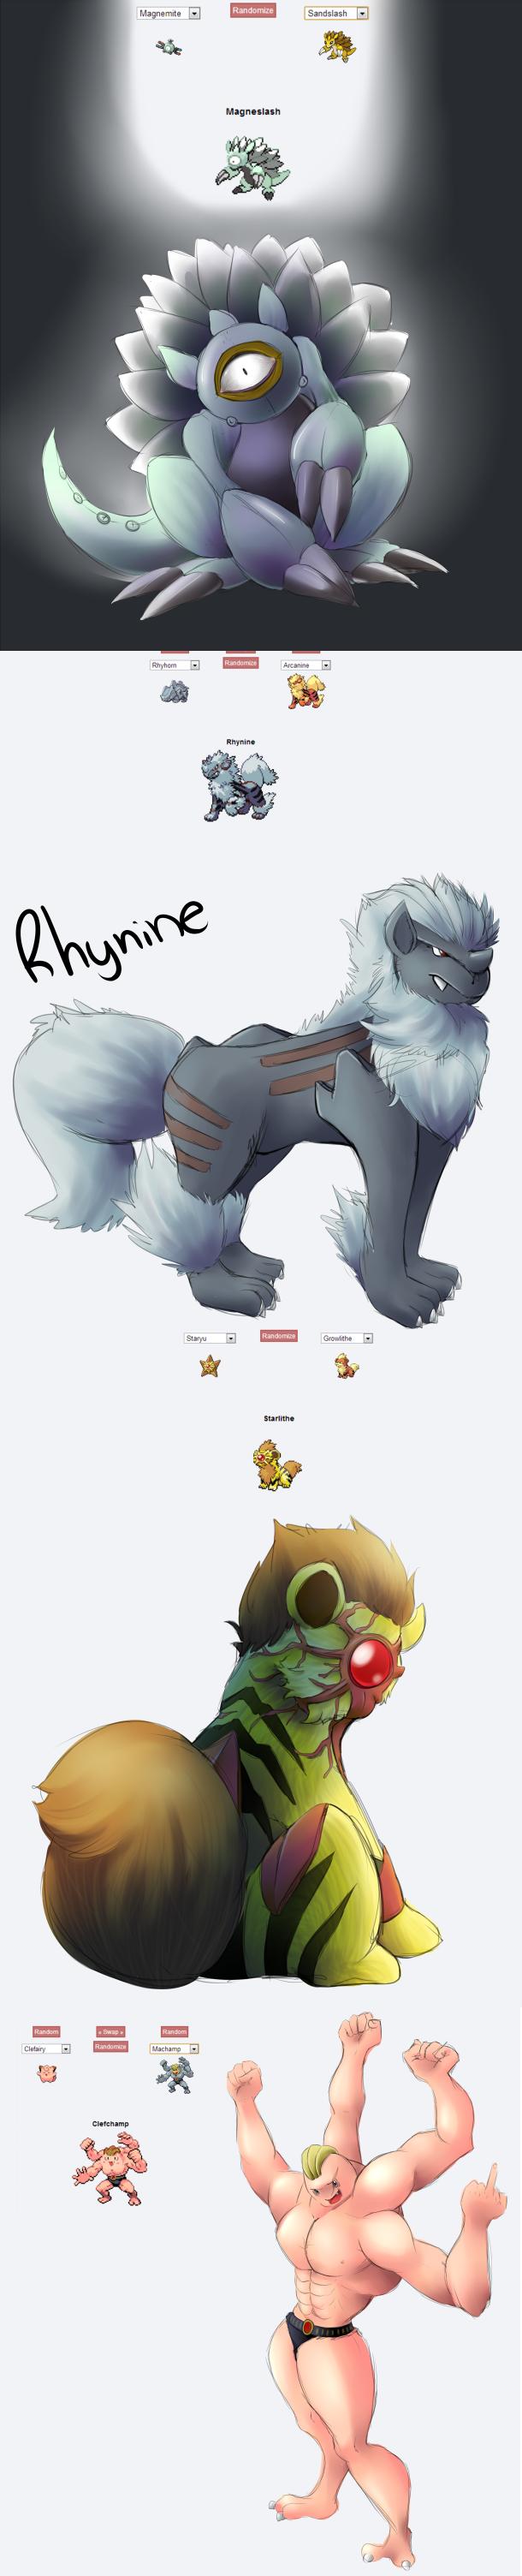 Pokemon Fusion Compilation 1. My Pokemon Fusion compilations so far. Which is your favorite? ^^ Art by me.. pokemon fusion Art Pokemon OC